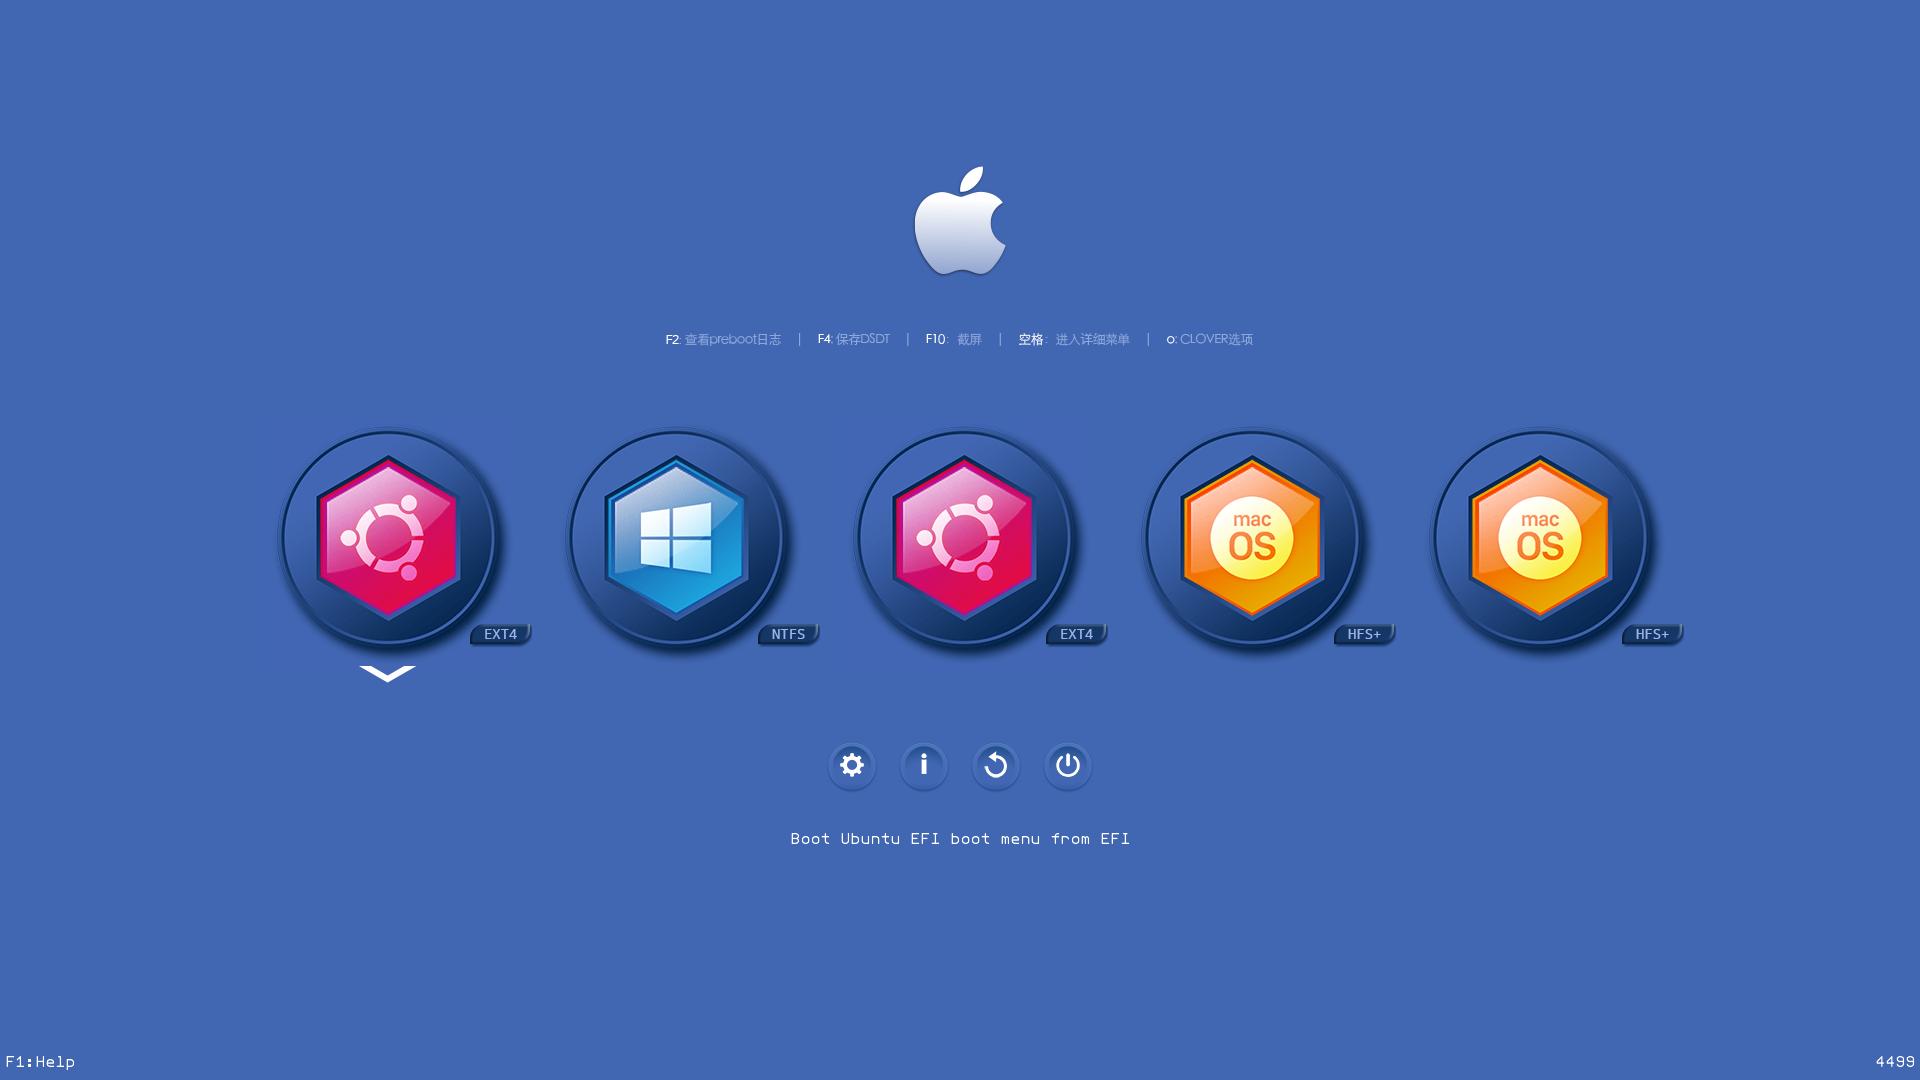 GitHub - suxiaogang/asrock-deskmini-110-hackintosh: asrock